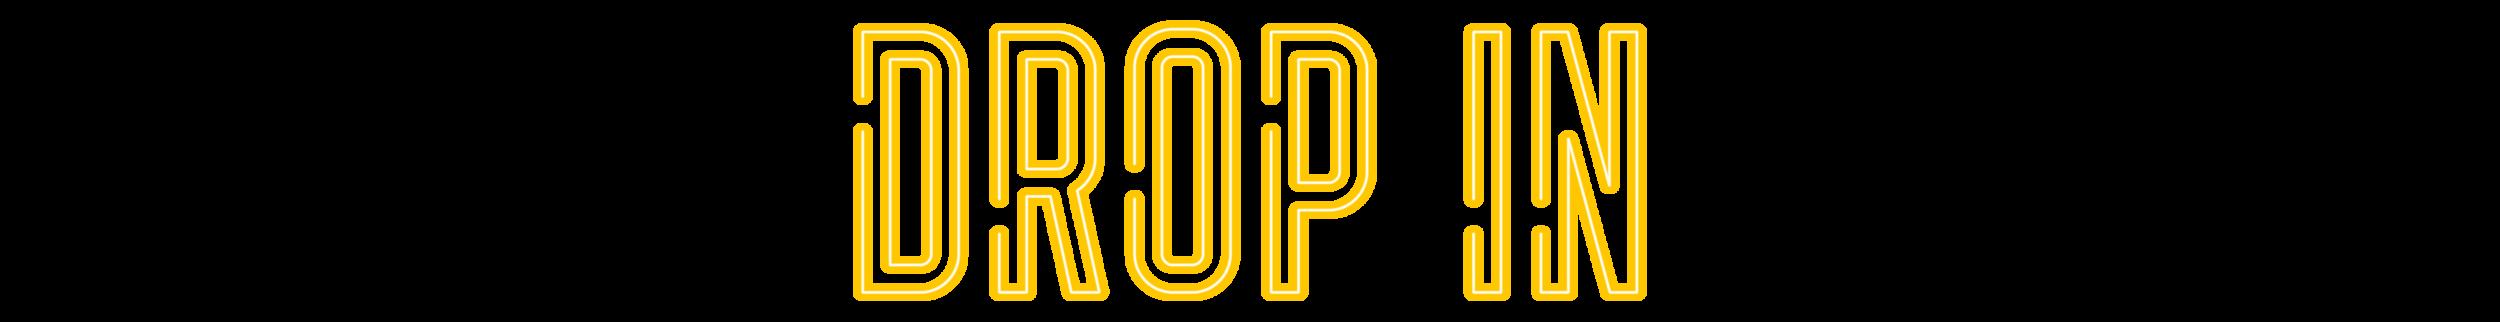 Drop In-01.png